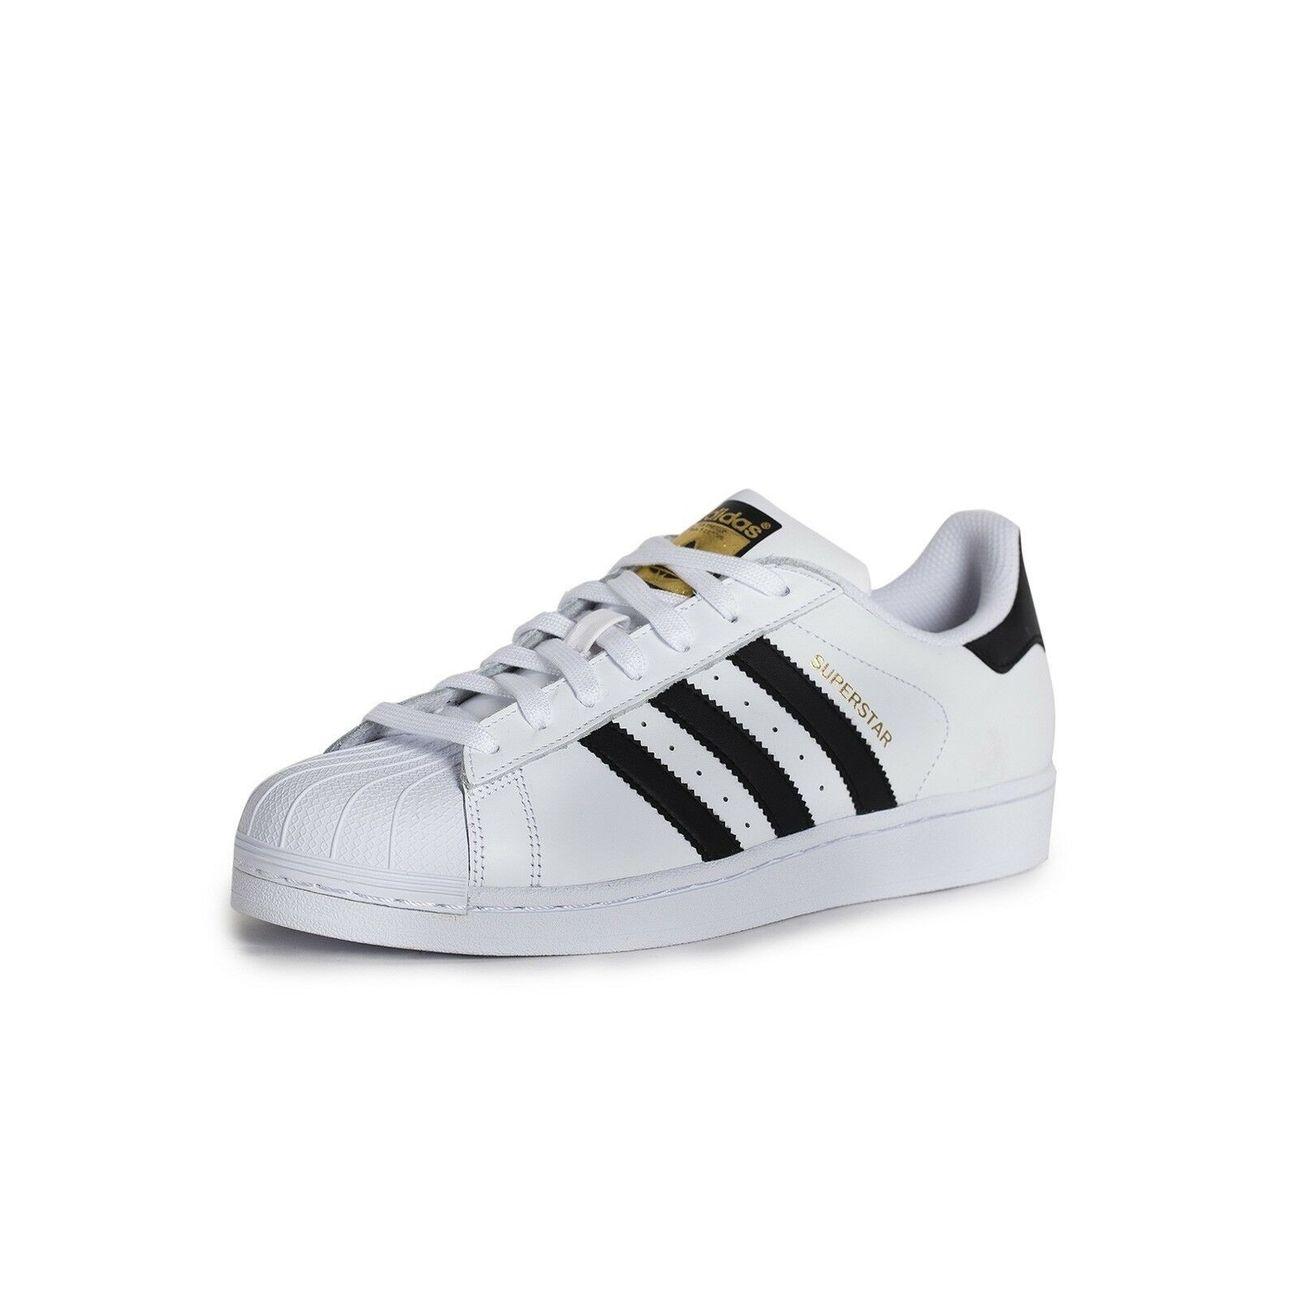 Mode- Lifestyle homme ADIDAS ORIGINALS Basket Adidas Originals Superstar - C77124